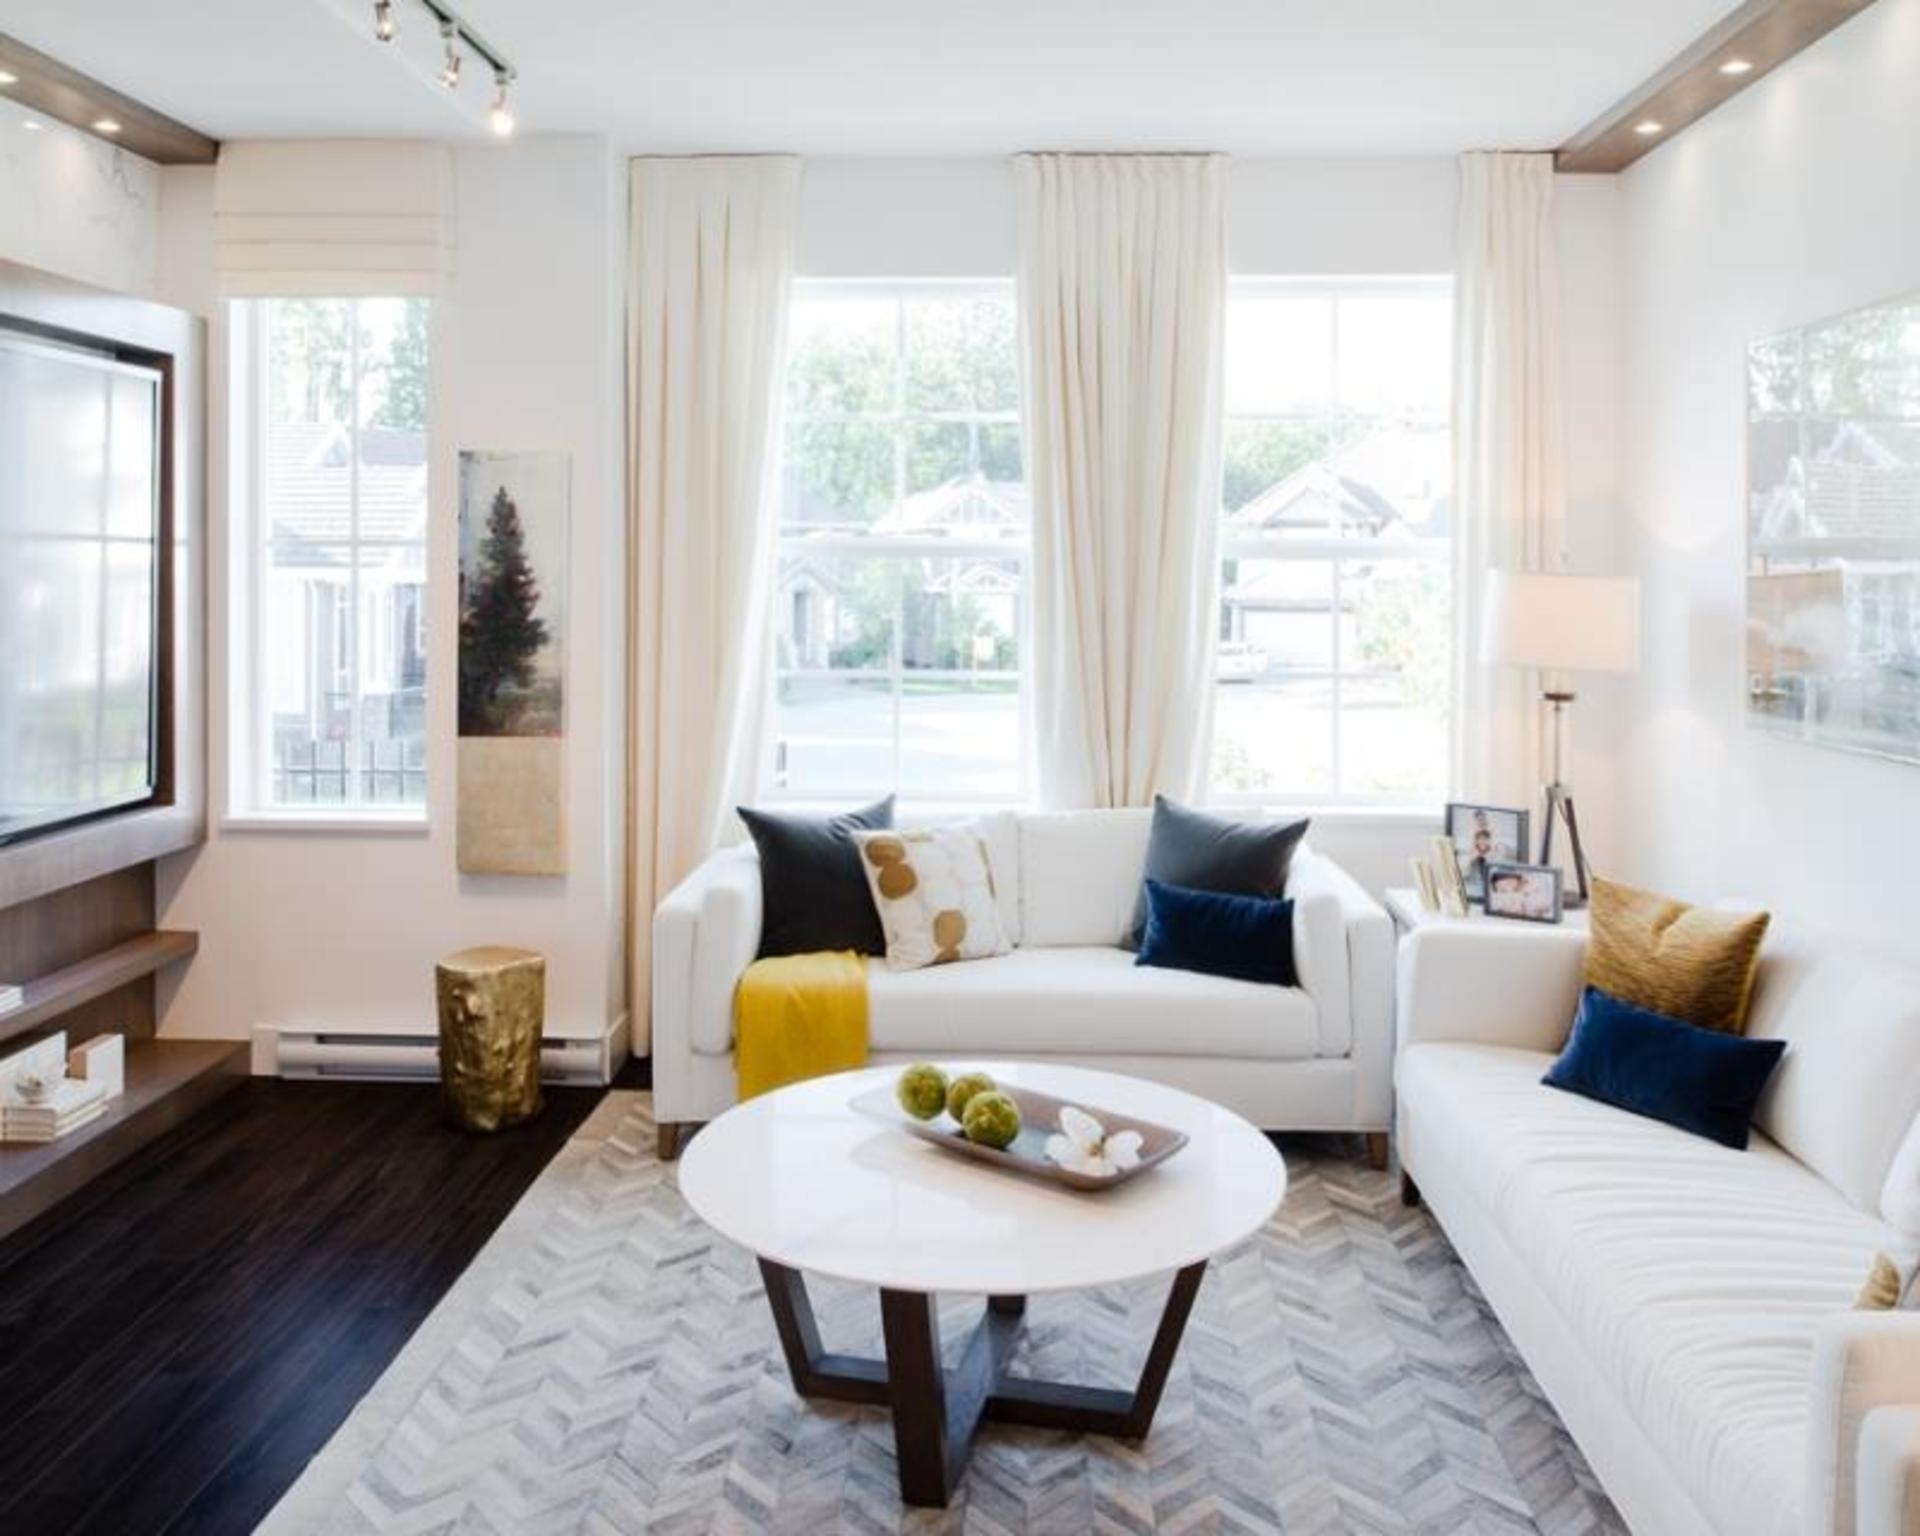 2015_12_23_11_49_26_polygon_homes_langley_ashbury_oak_townhomes_interior at Ashbury + Oak Townhomes (8138 204th Street, Willoughby Heights, Langley)